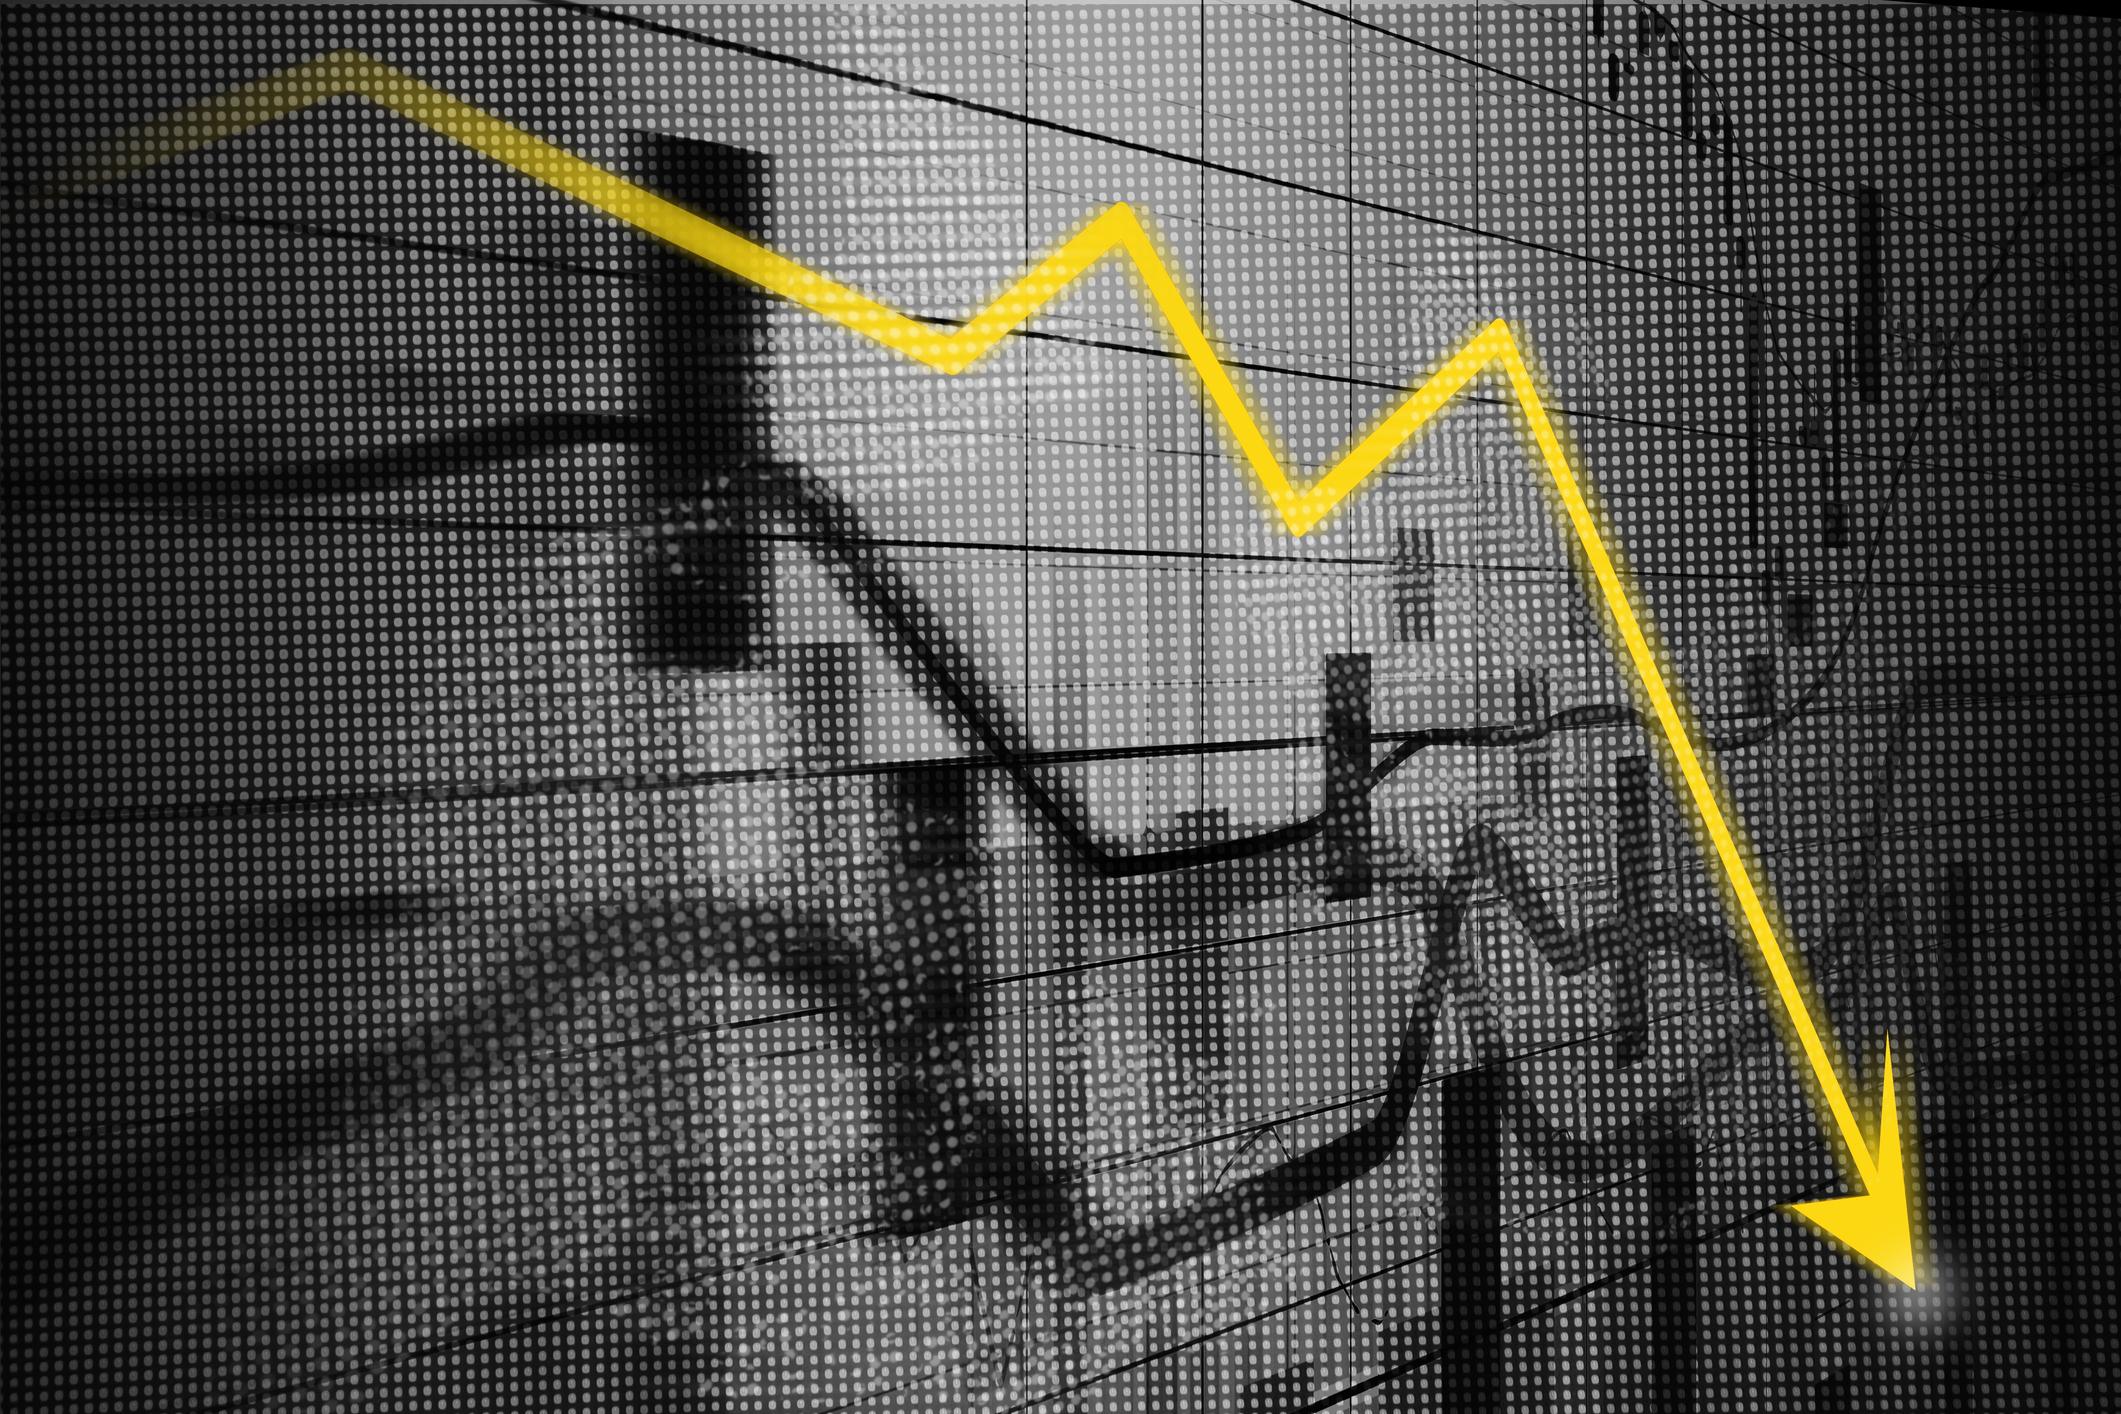 It's Not Just the Coronavirus That's Causing Stock Market Volatility | The Motley Fool